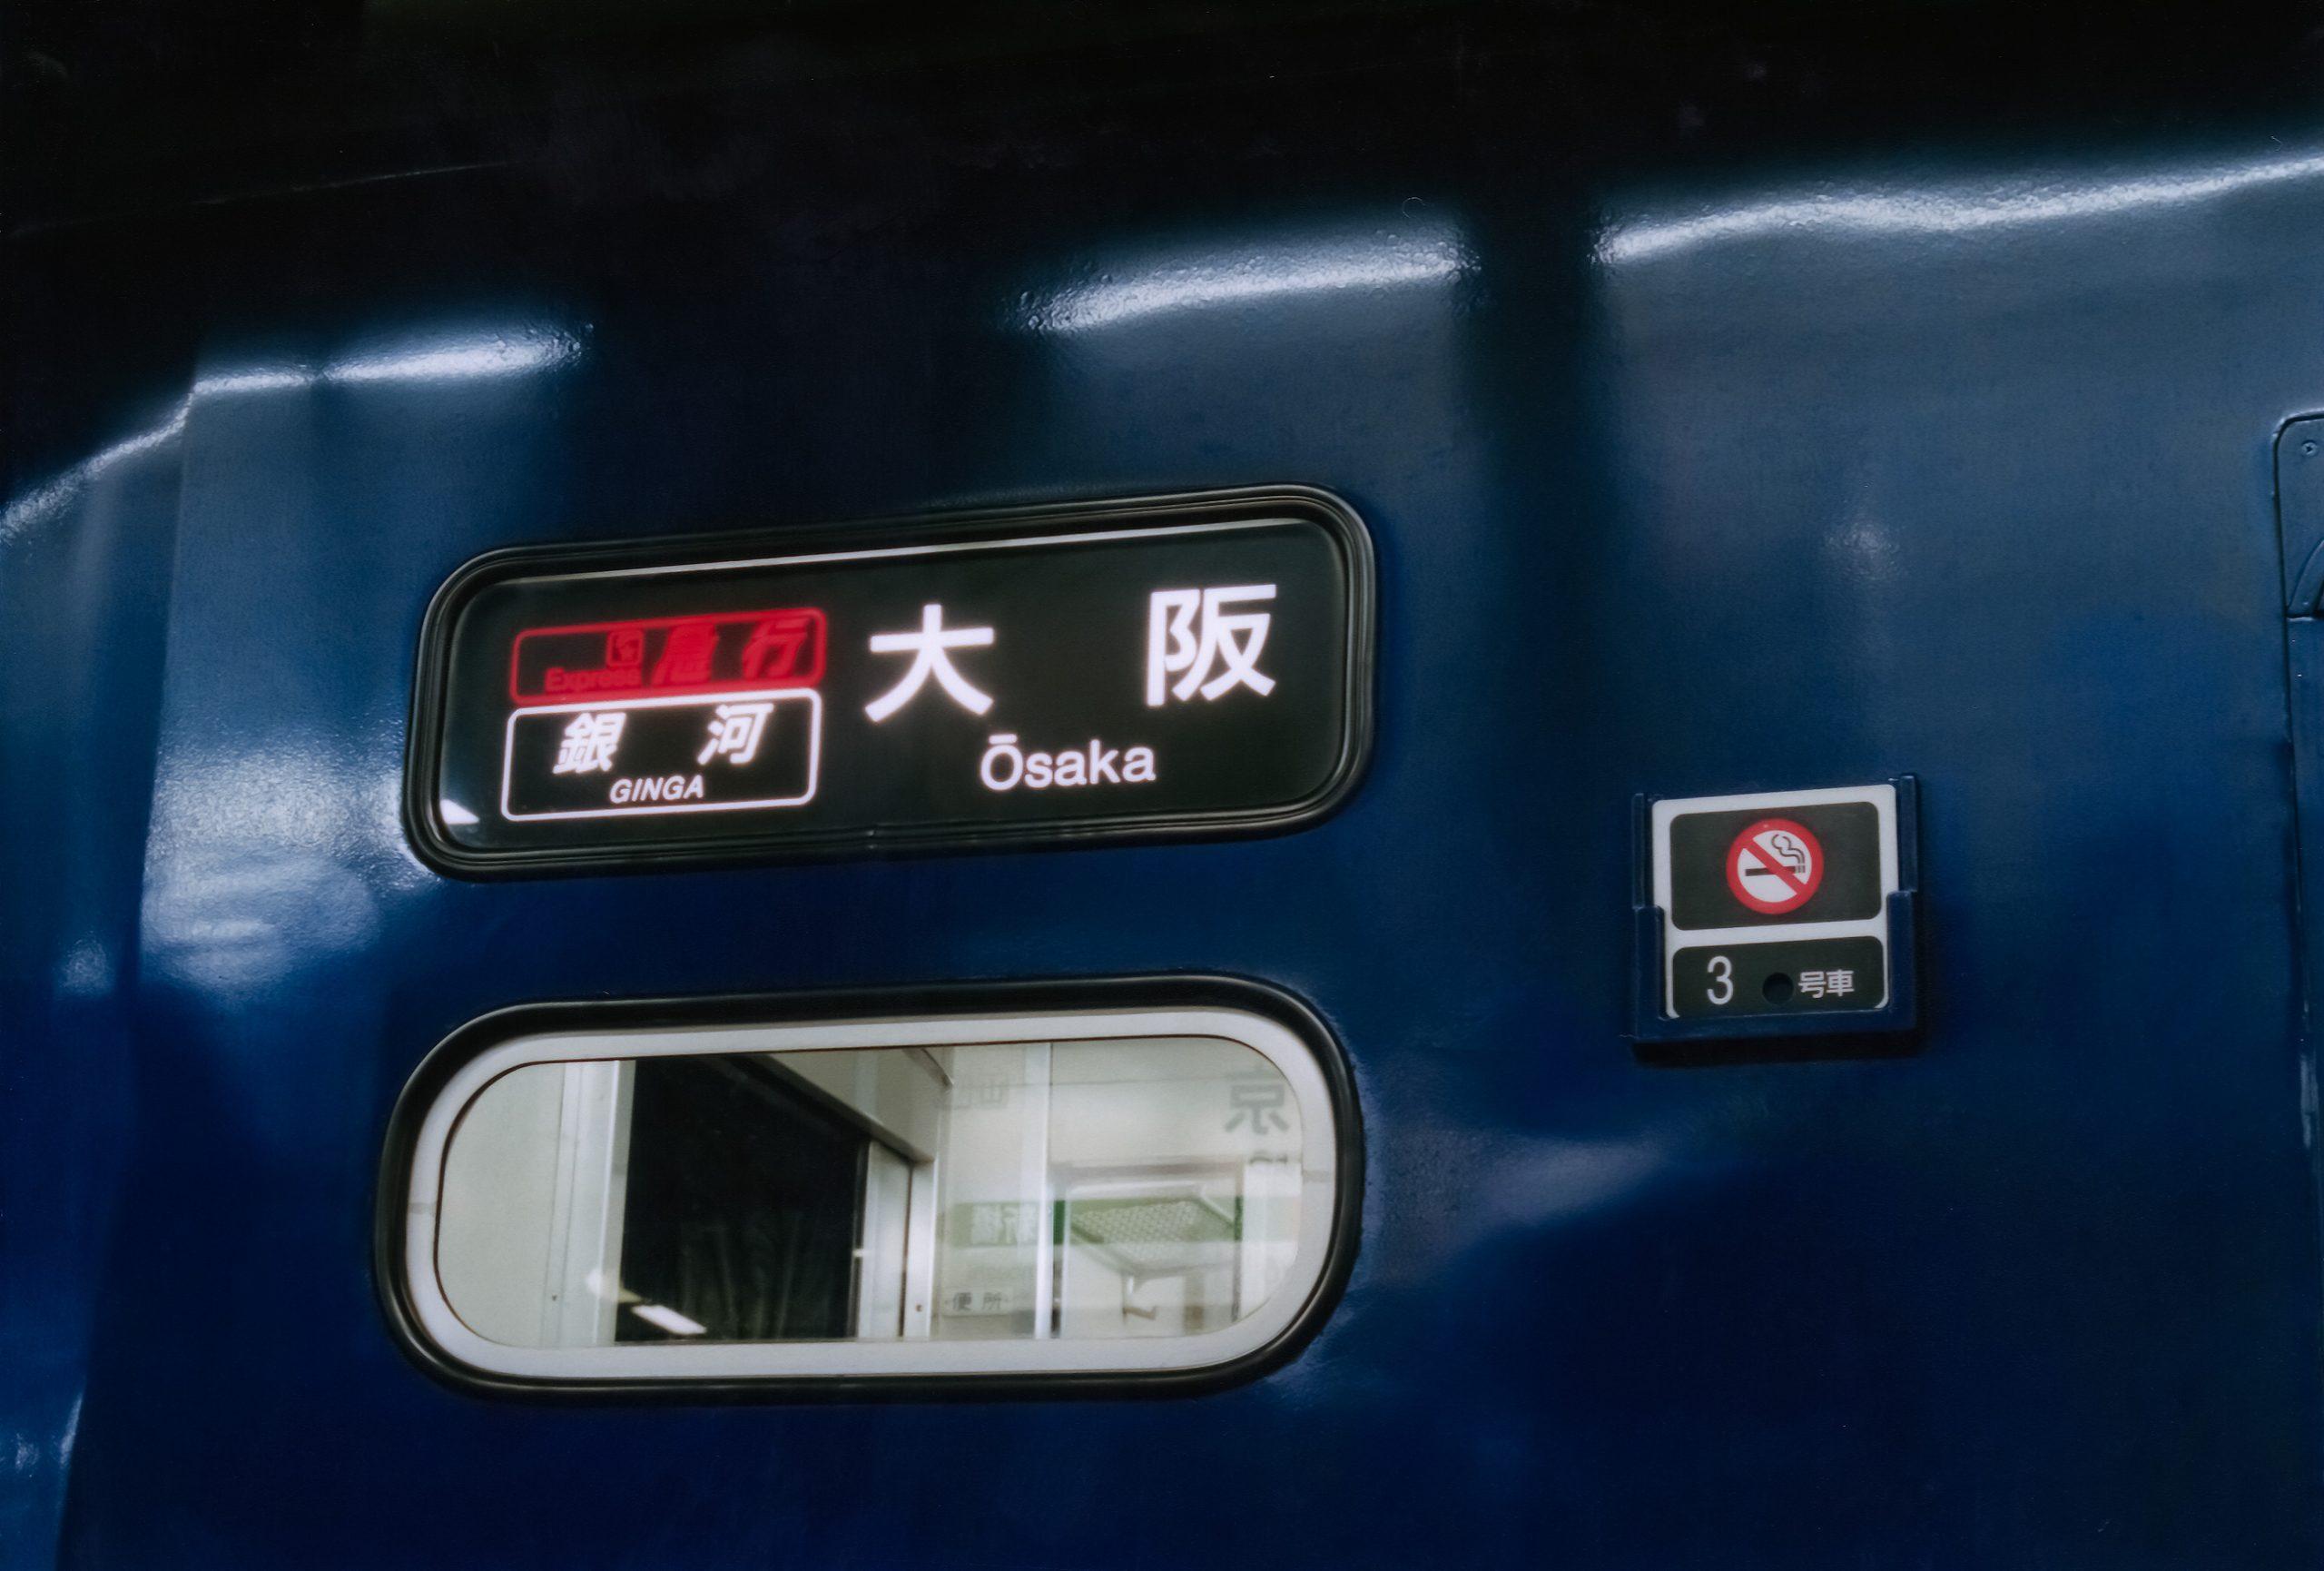 JR東海道本線・東京駅・寝台急行「銀河」(東京都:2001年7月)